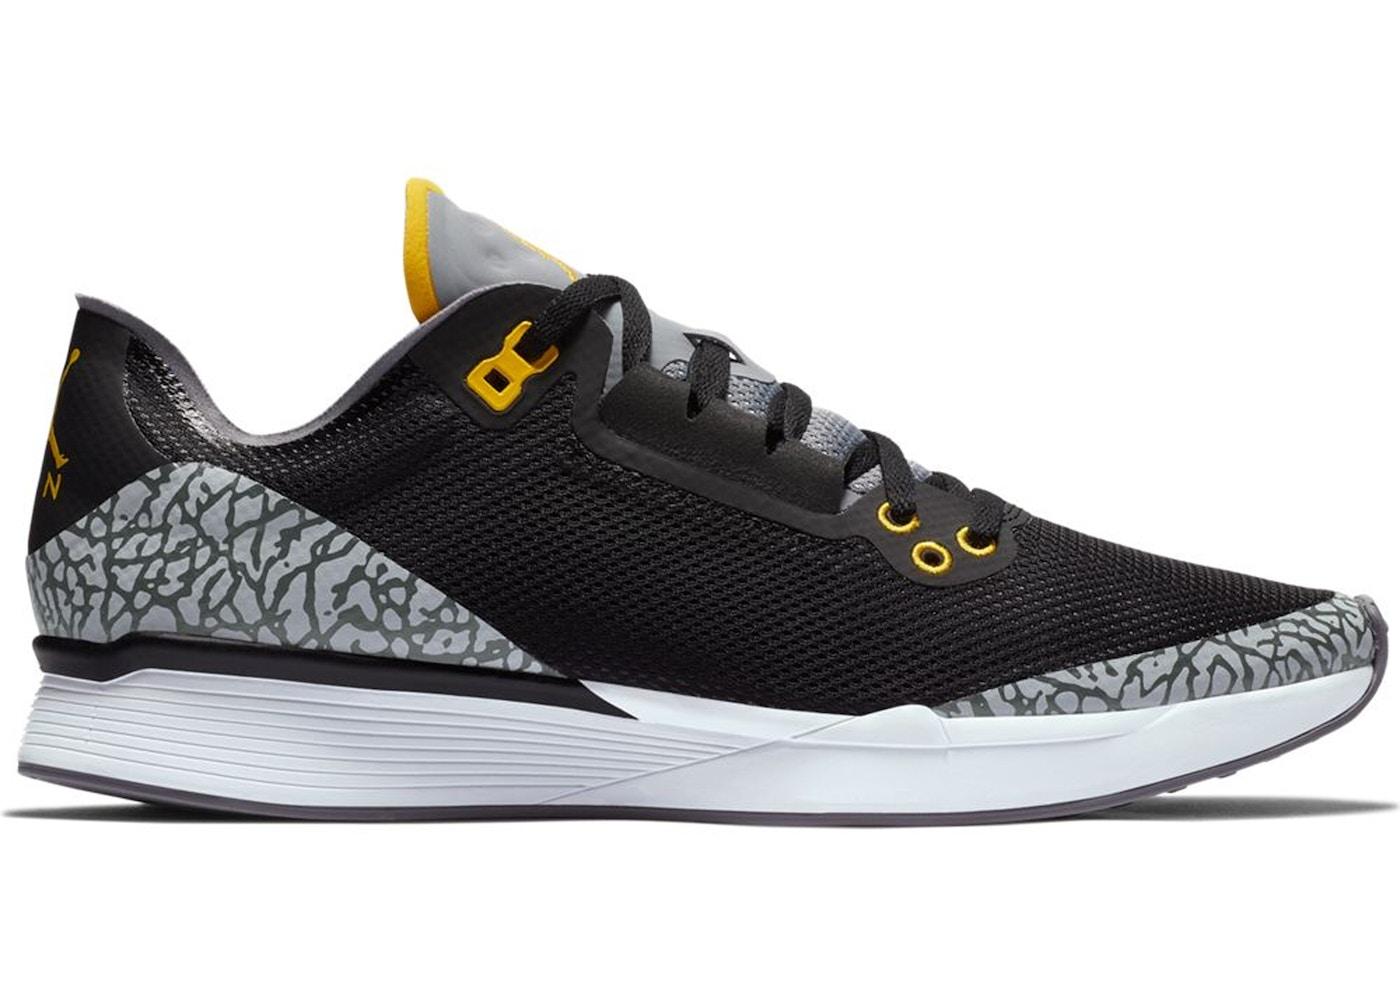 brand new a6fab d47d2 Air Jordan Other Shoes - Volatility